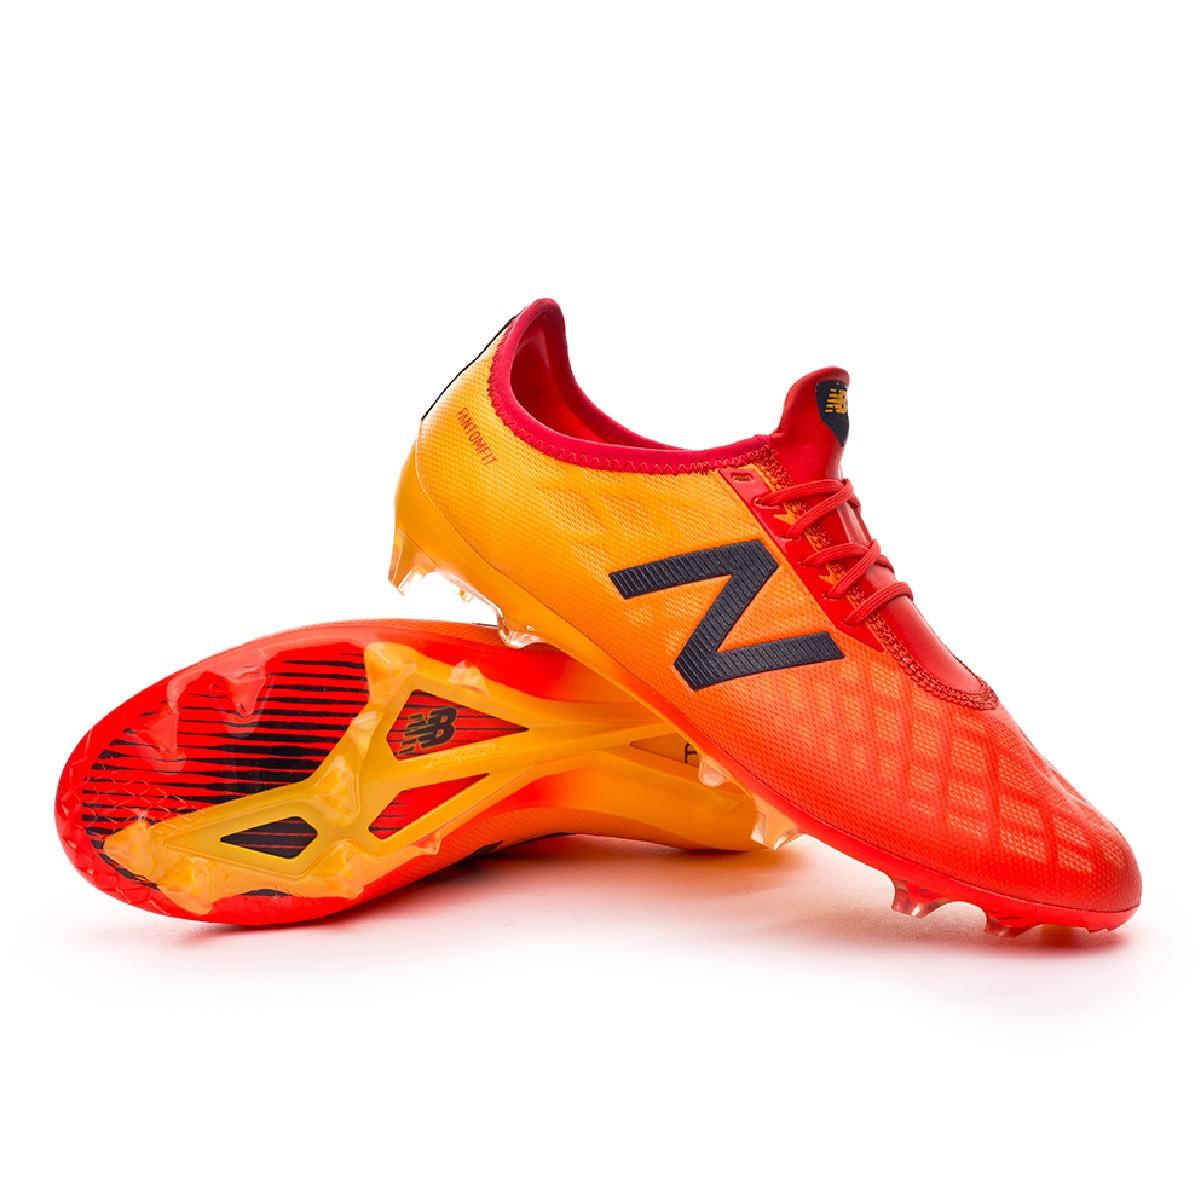 c1fa78e0e Football Boots New Balance Furon 4.0 Pro FG Flame - Football store Fútbol  Emotion